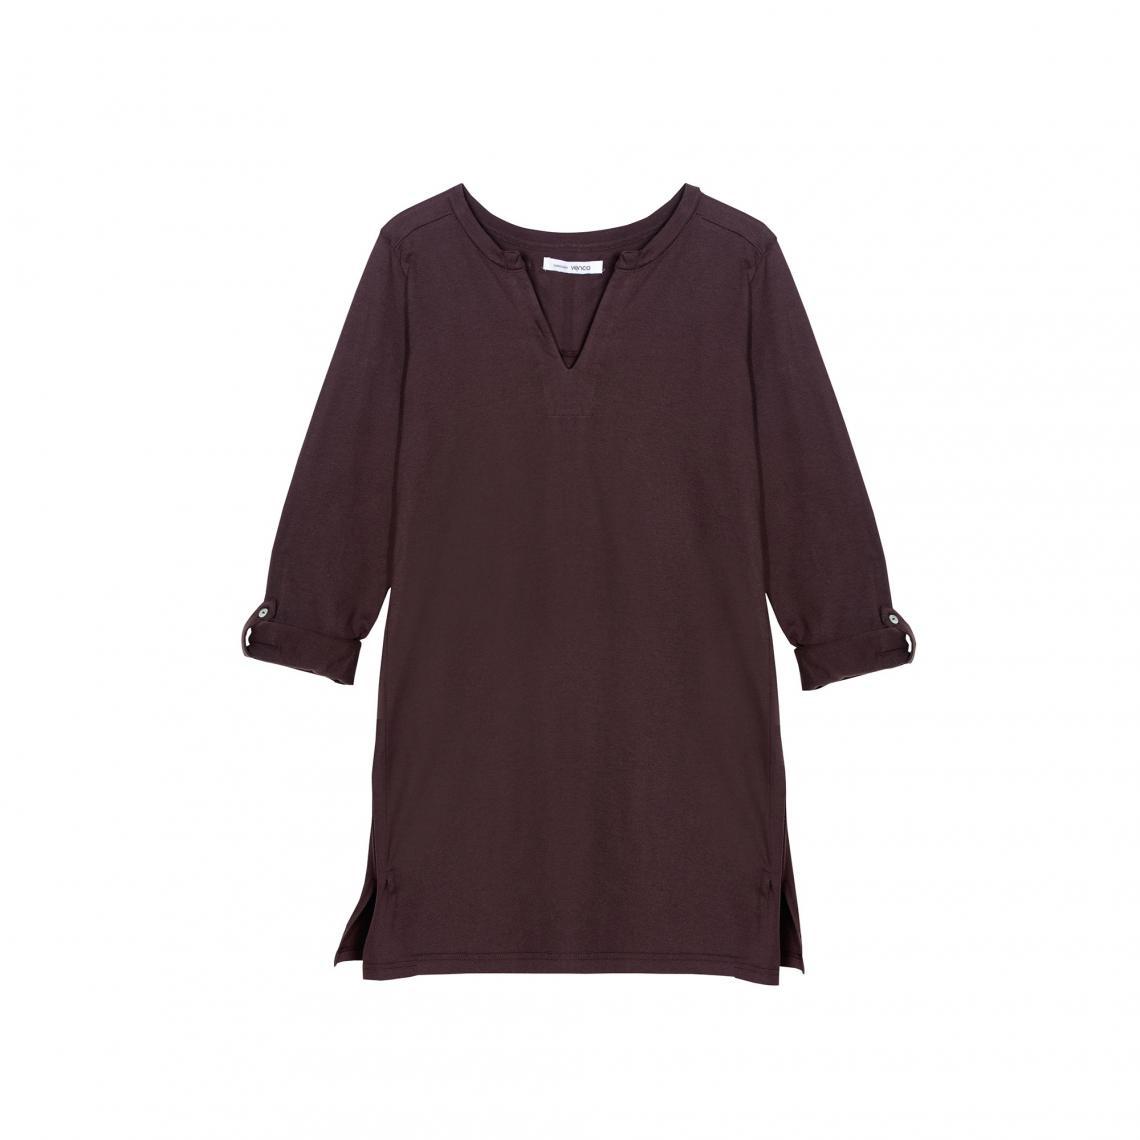 Promo : Tee-shirt long fendu manches longues ajustables - Marron Foncé - 3 SUISSES - Modalova